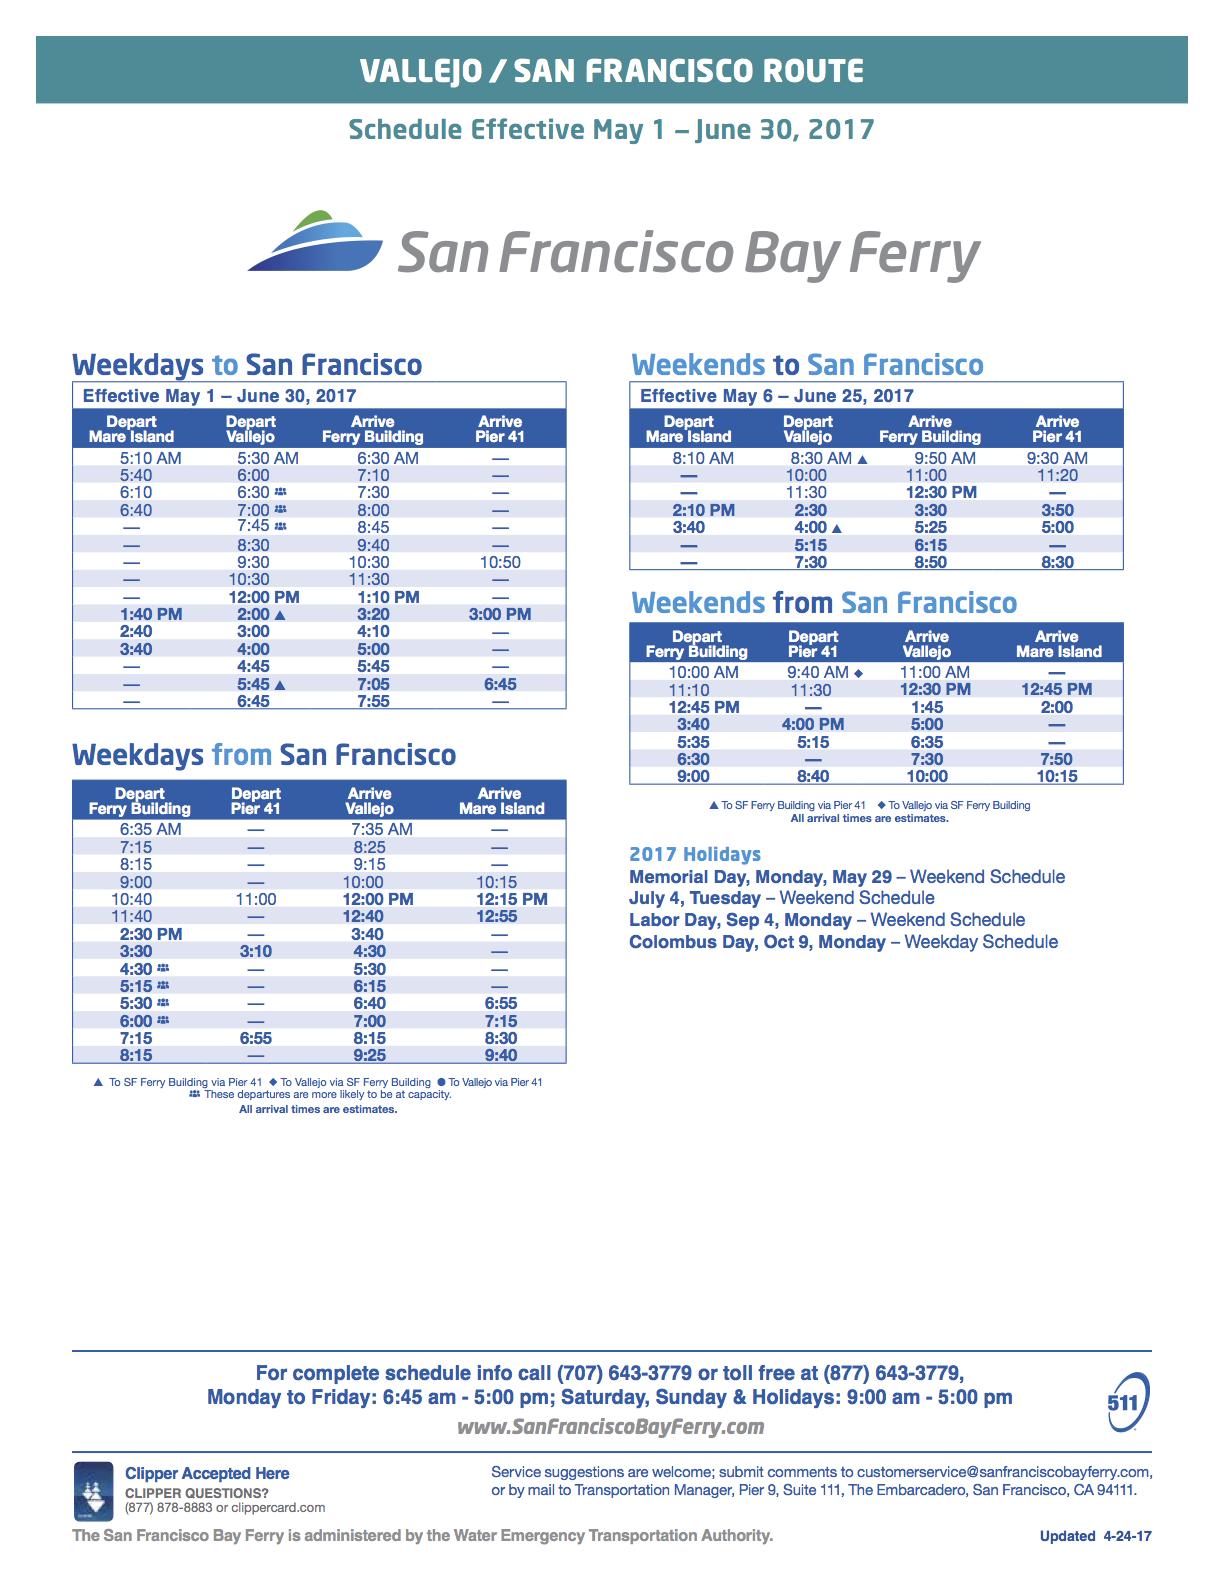 vallejo to san francisco ferry schedule spring 2017 - vallejo bay ferry